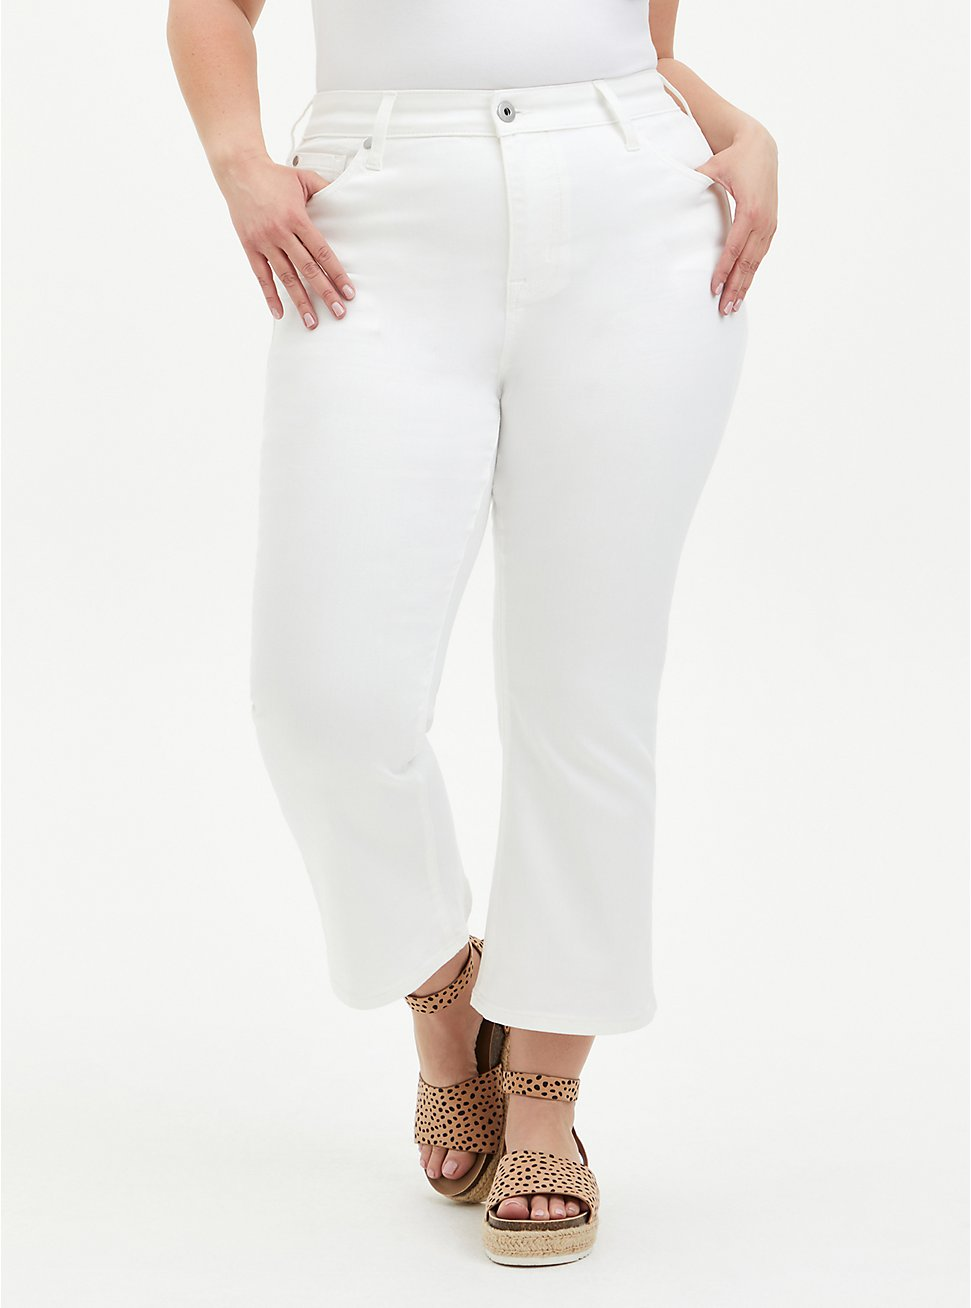 Crop Mid Rise Flare Jean - Super Soft White, WINTER WHITE, hi-res